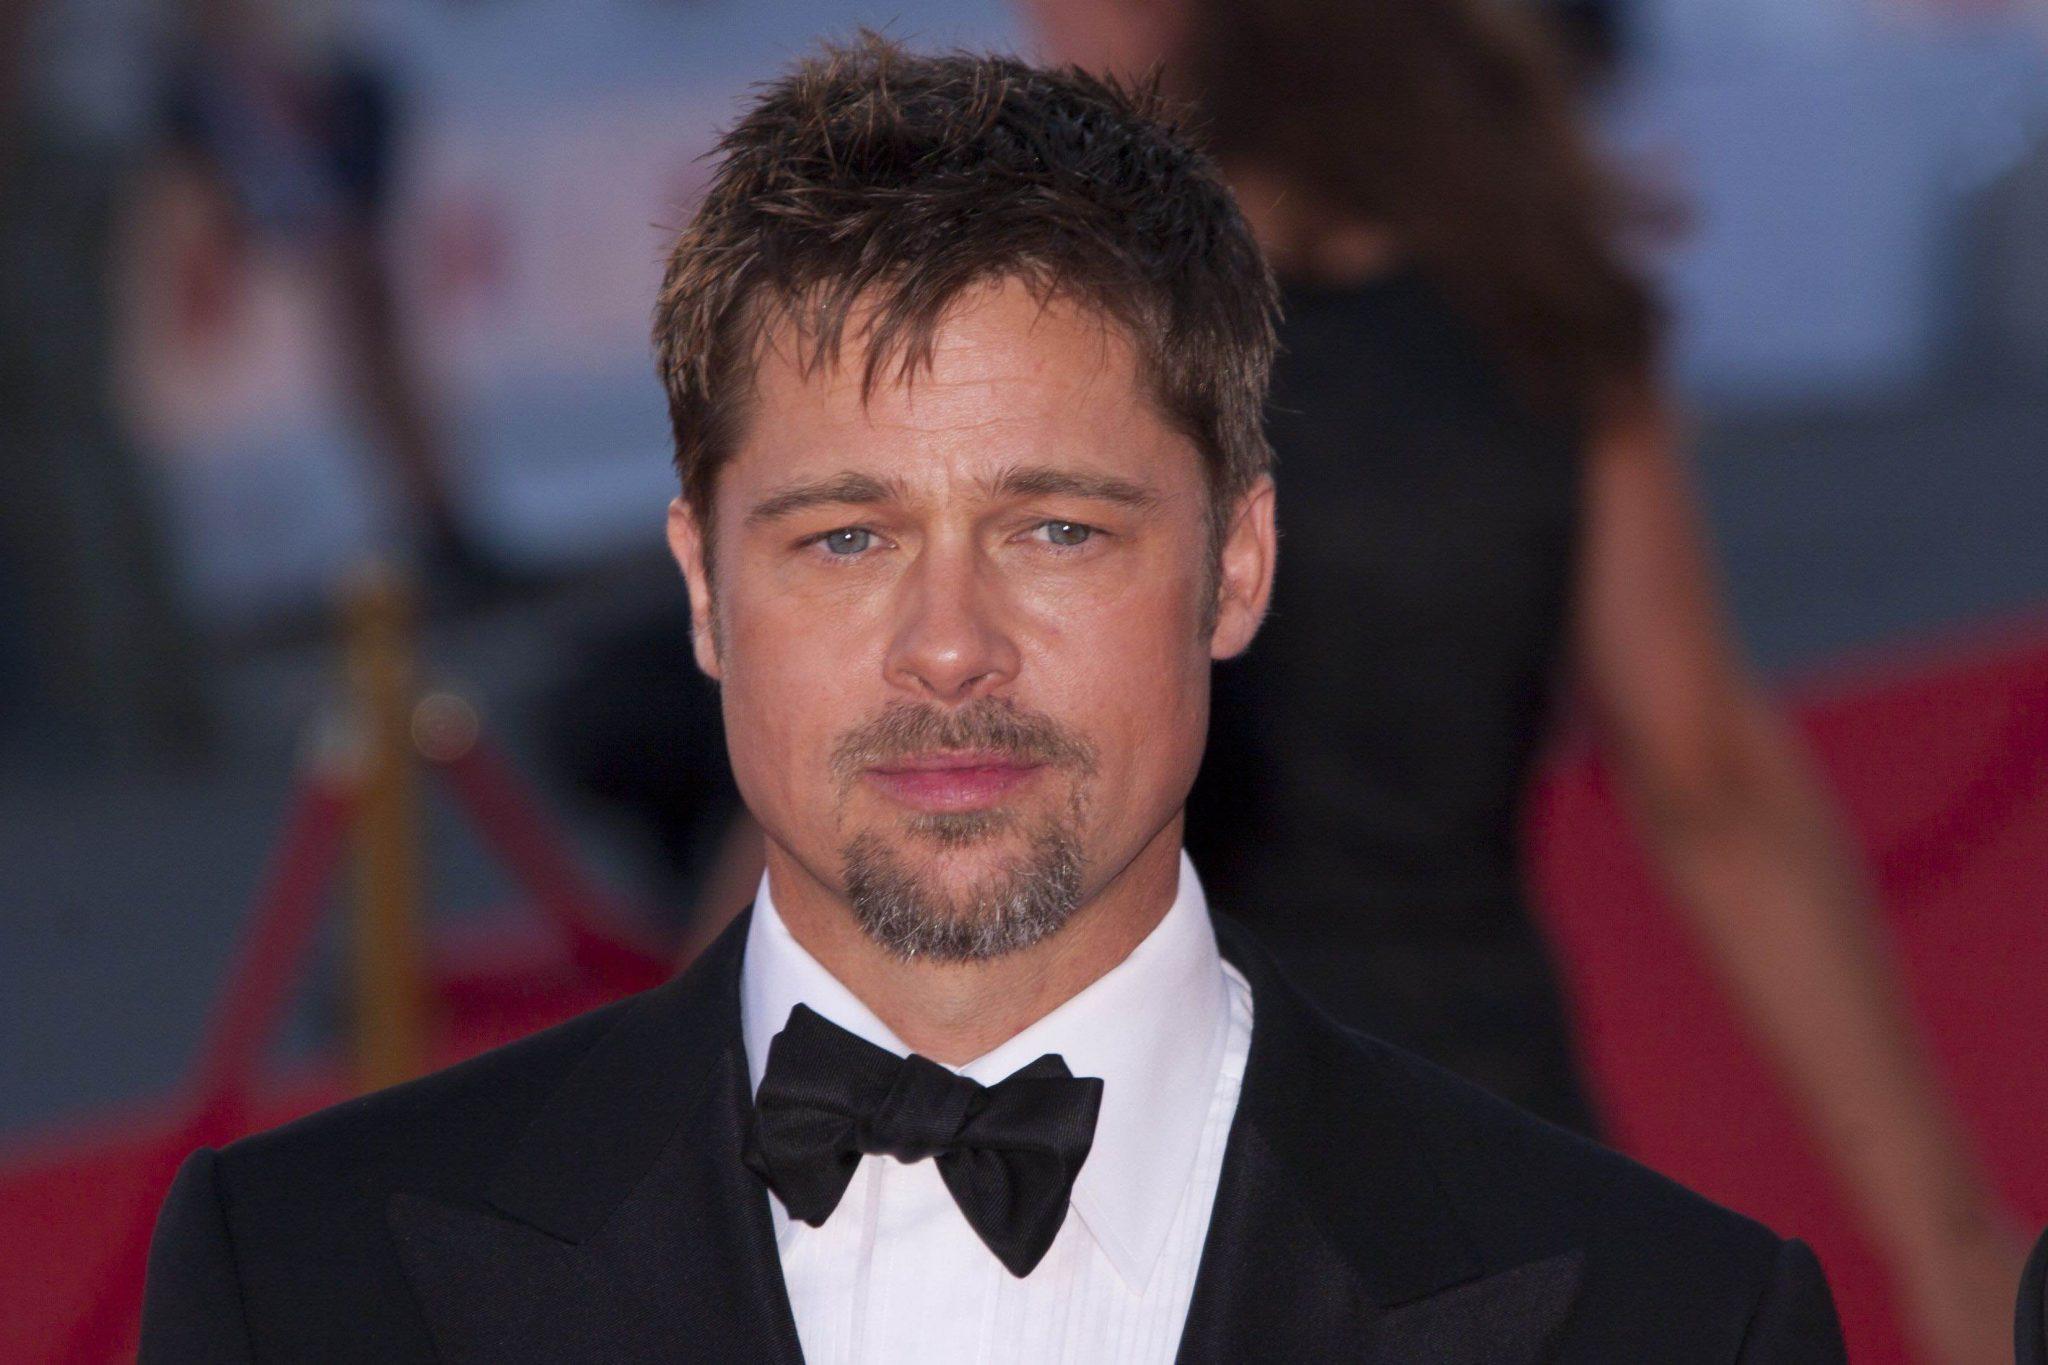 Brad Pitt has often had a beard in his film roles - here he sports a well kept goatee beard